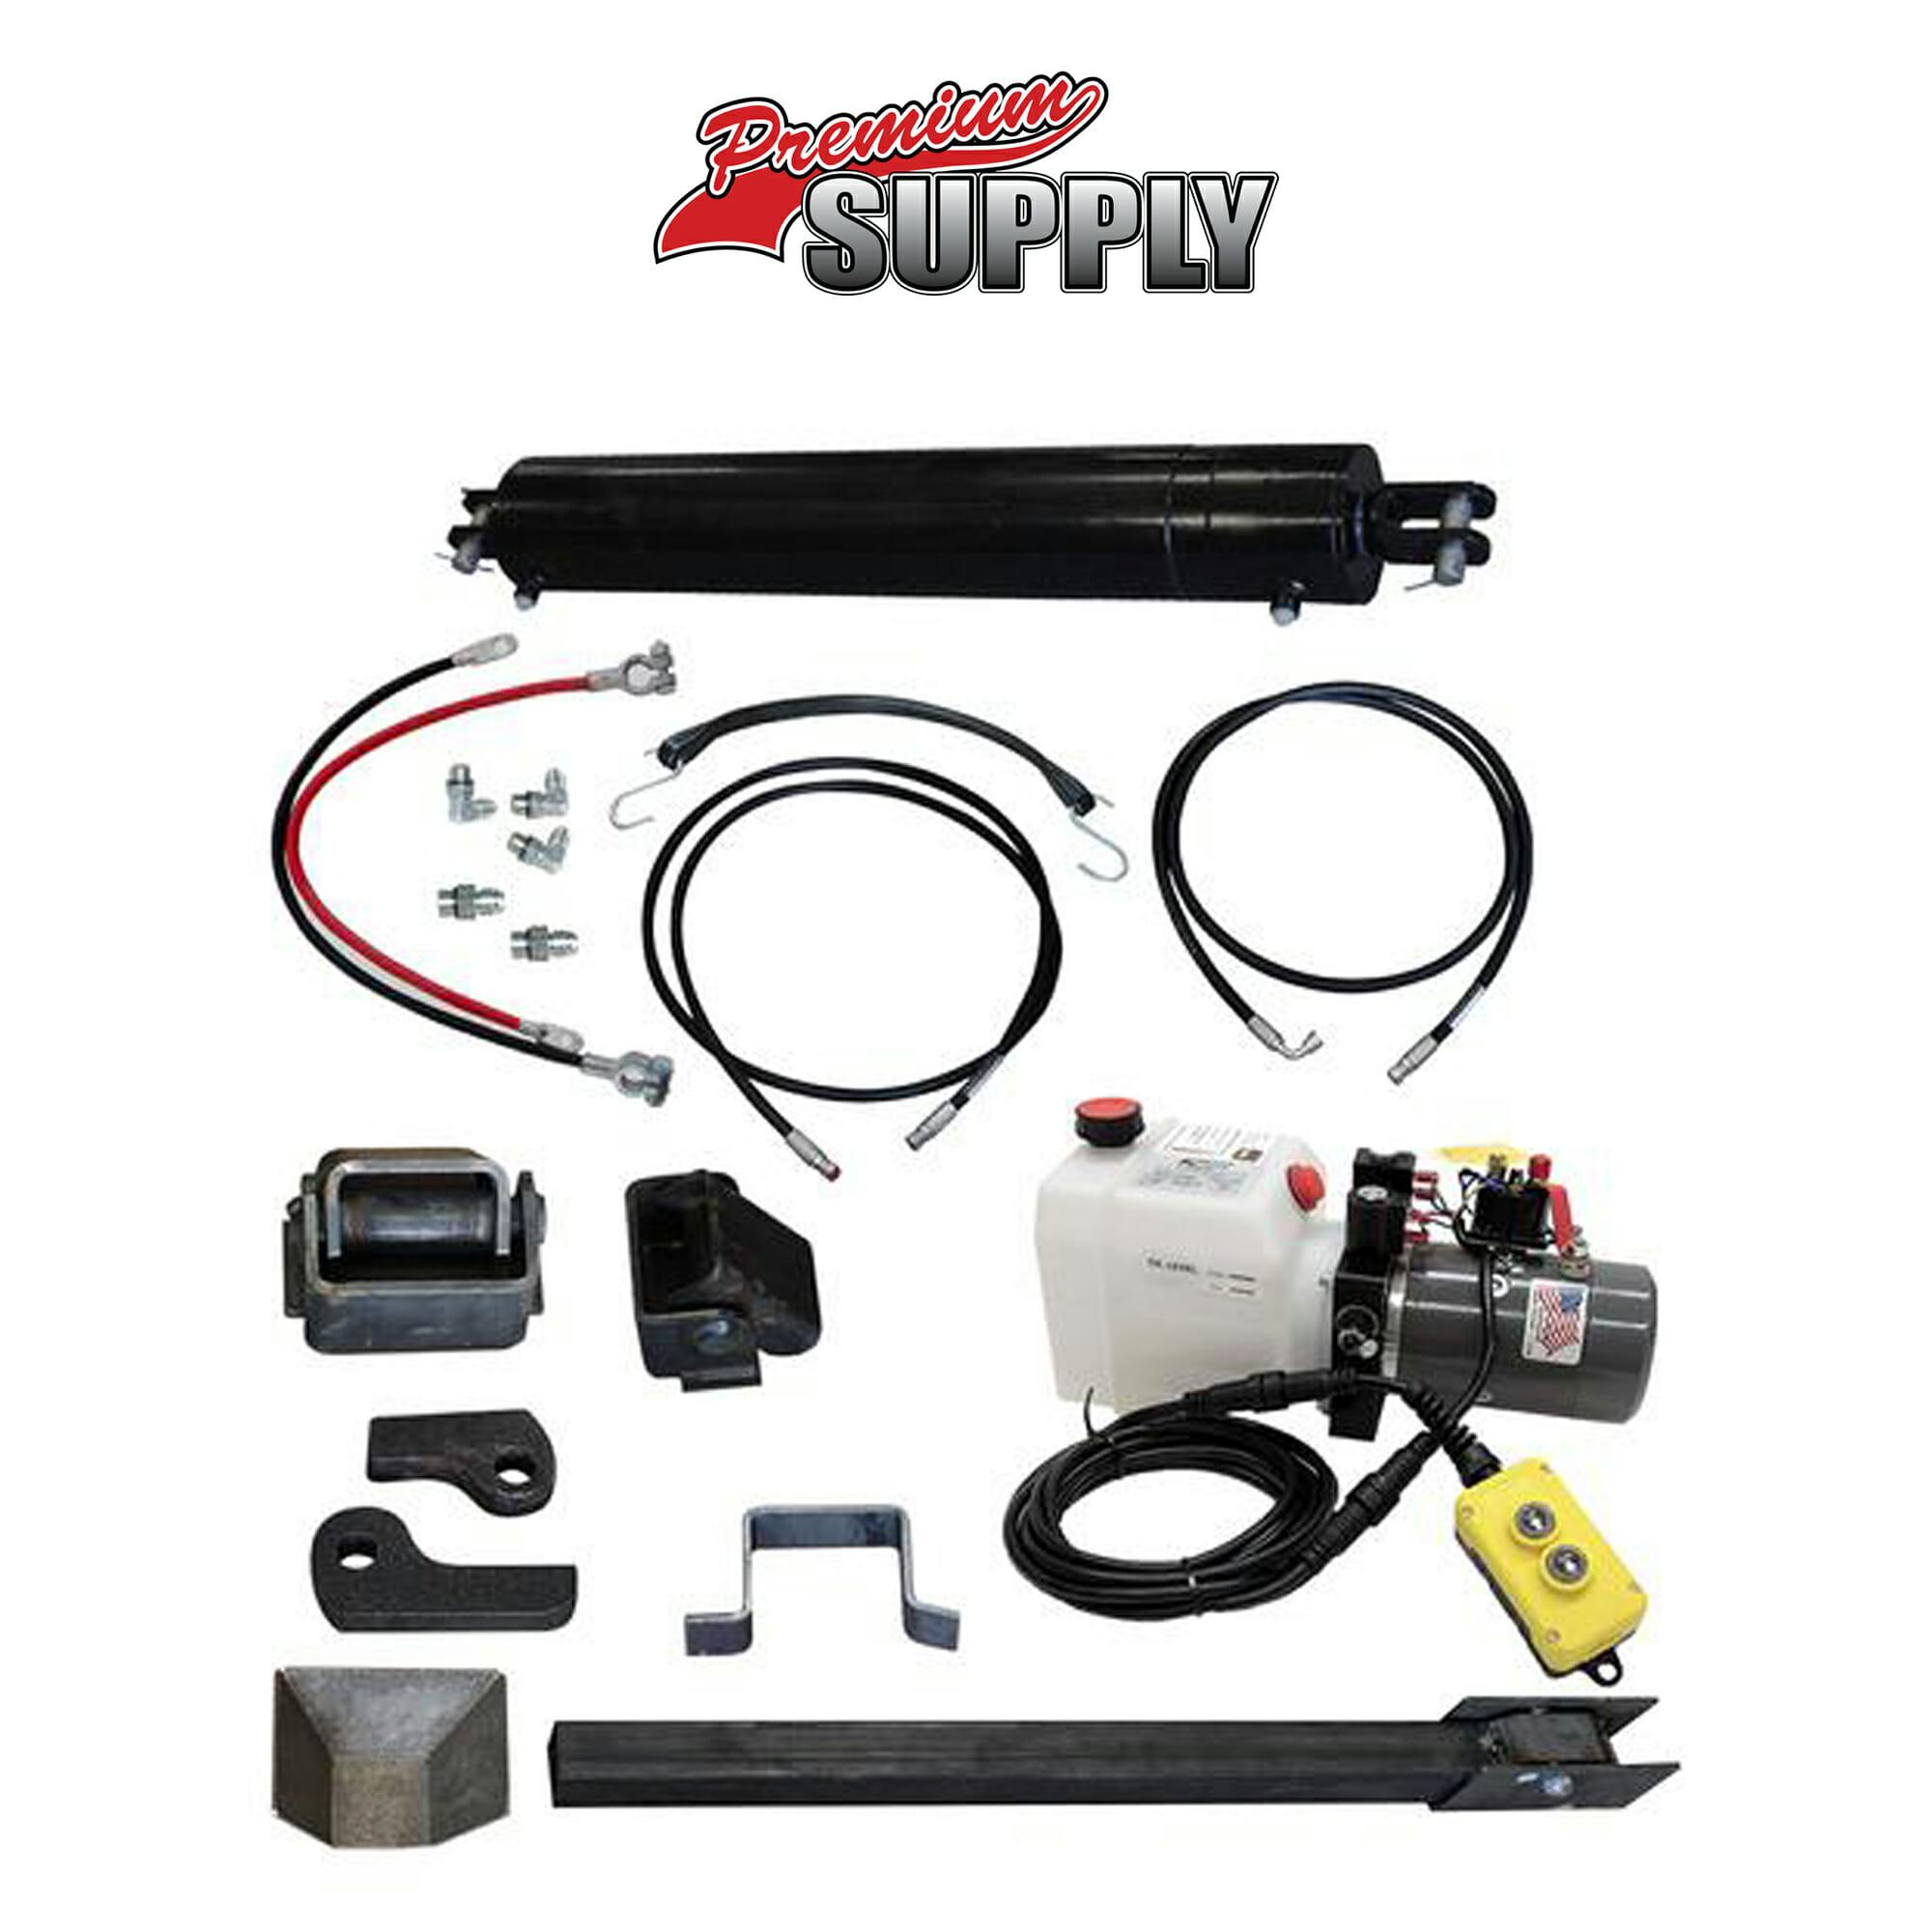 Hydraulic Trailer Lift Kits : Dump trailer hydraulic cylinder direct push kit pck